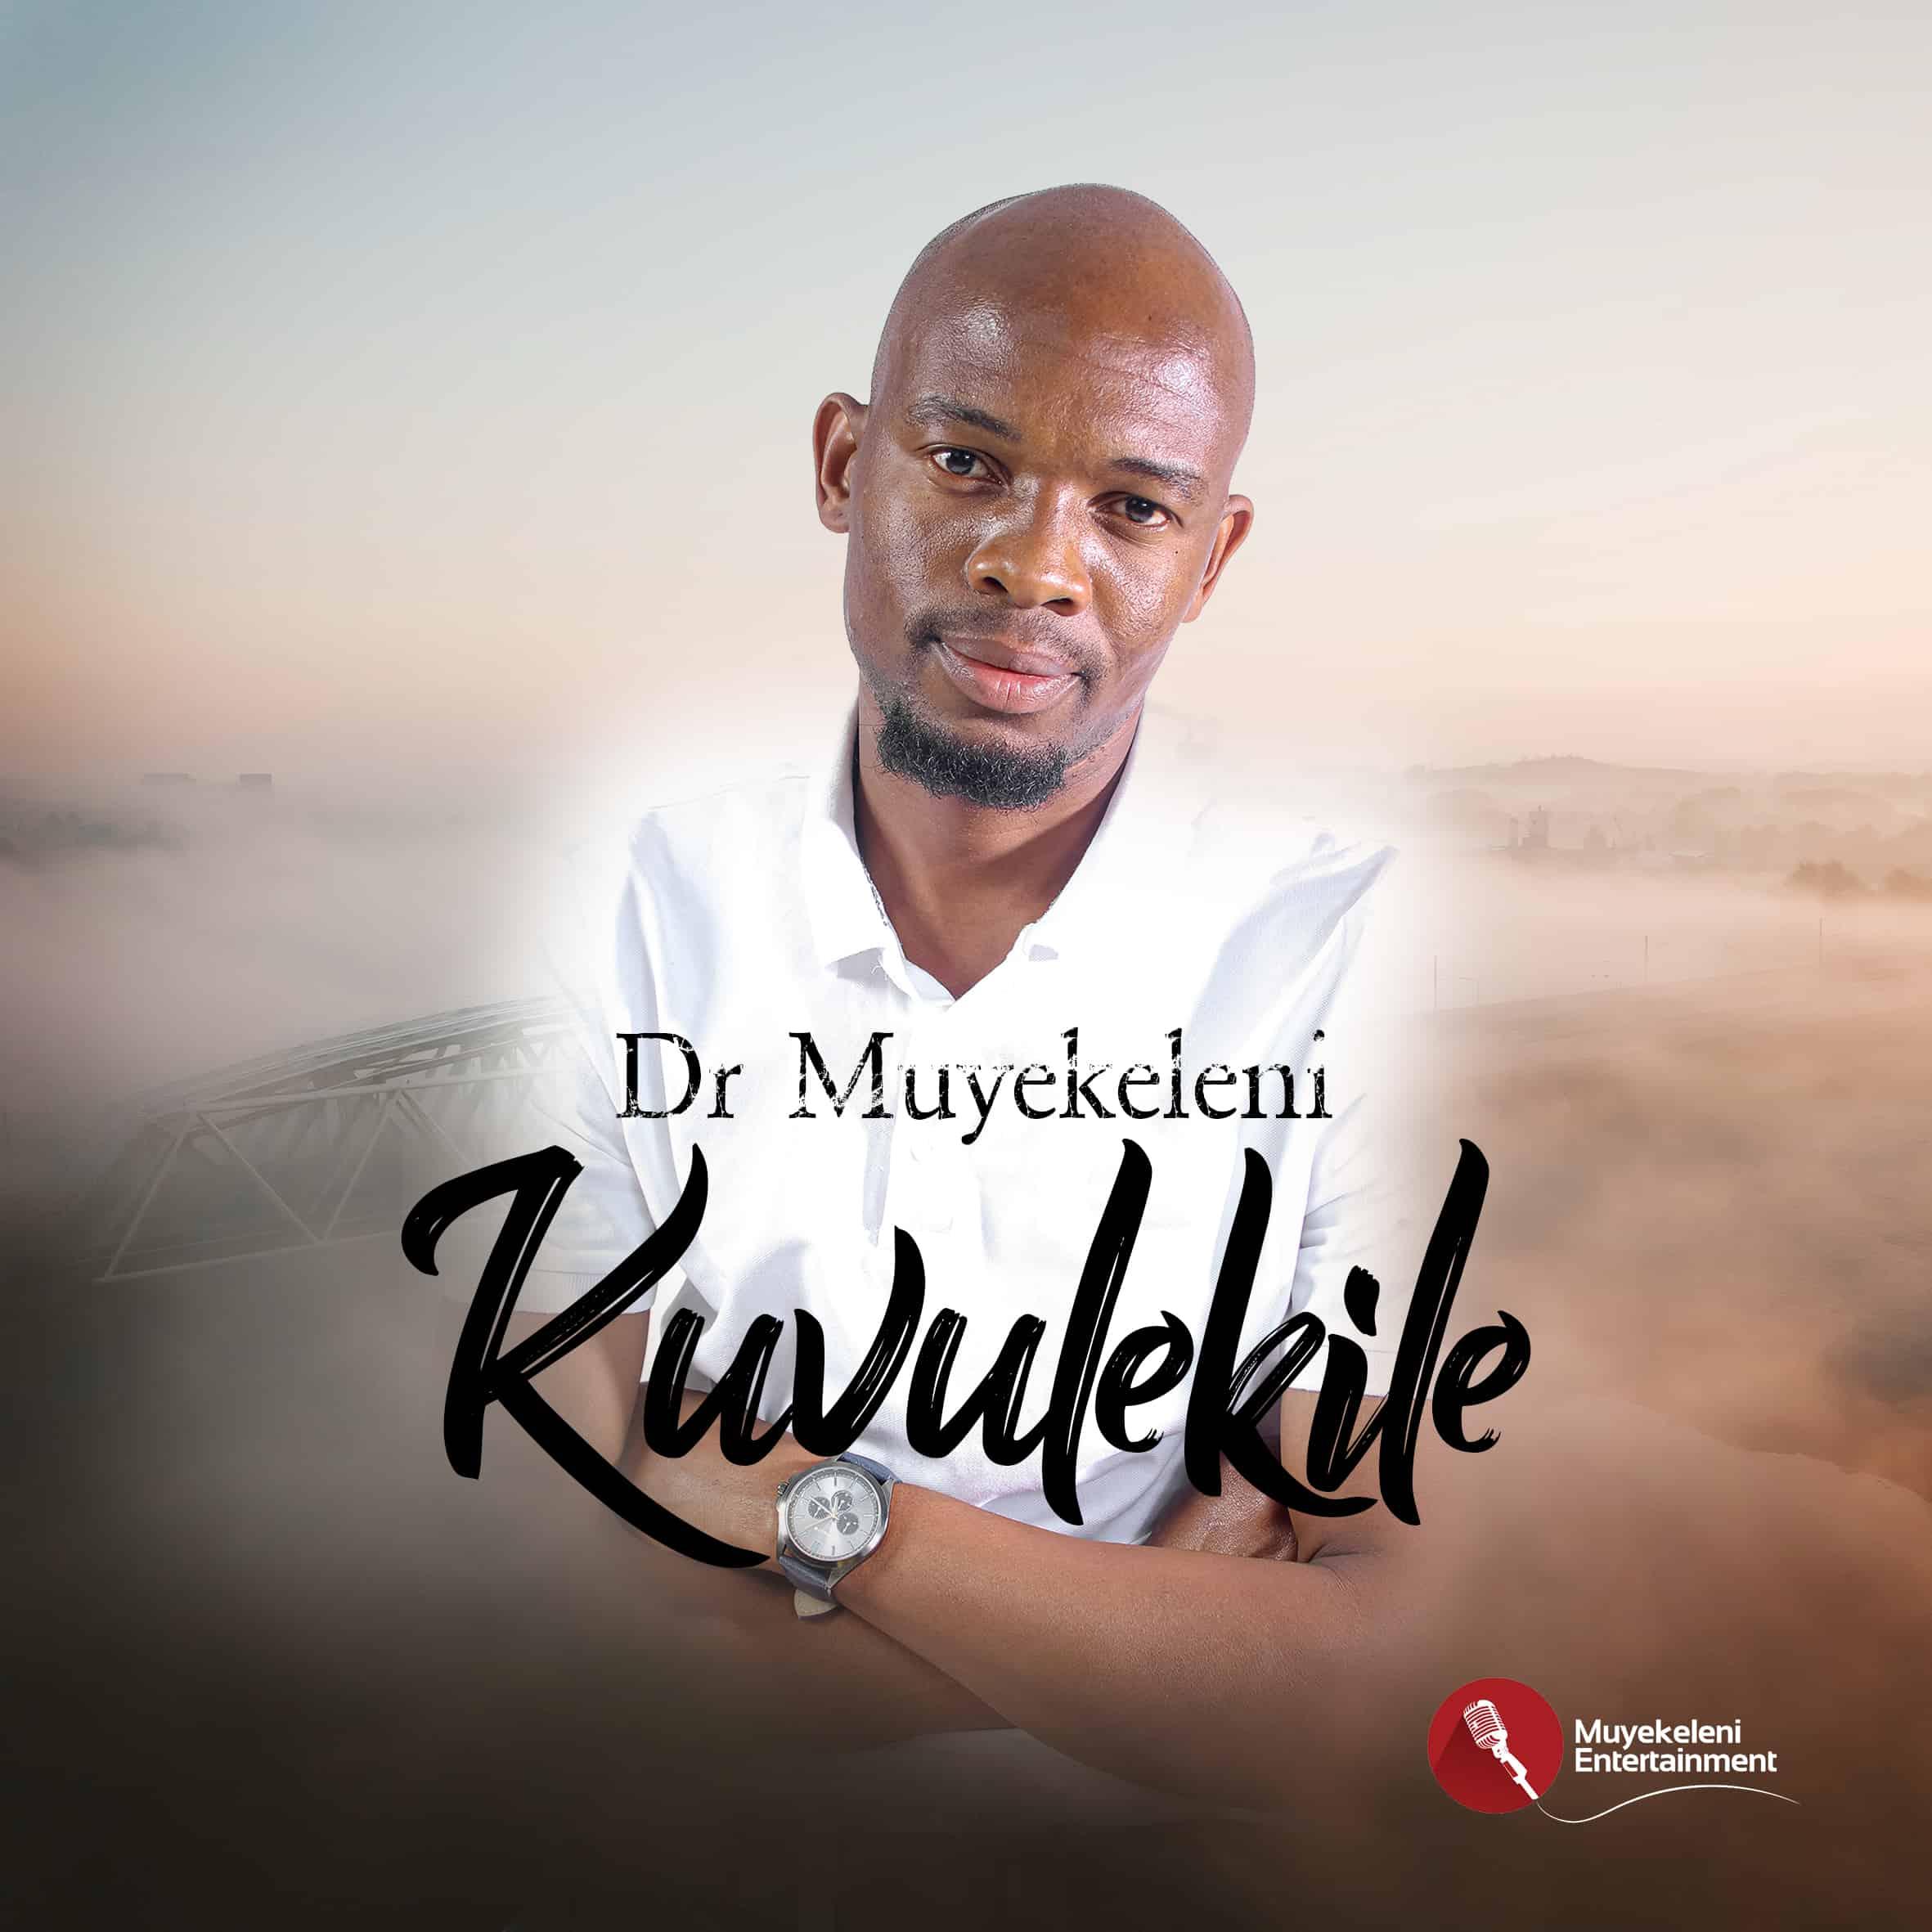 Dr Muyekeleni - Kuvulekile (Feat. Thami Enlite)